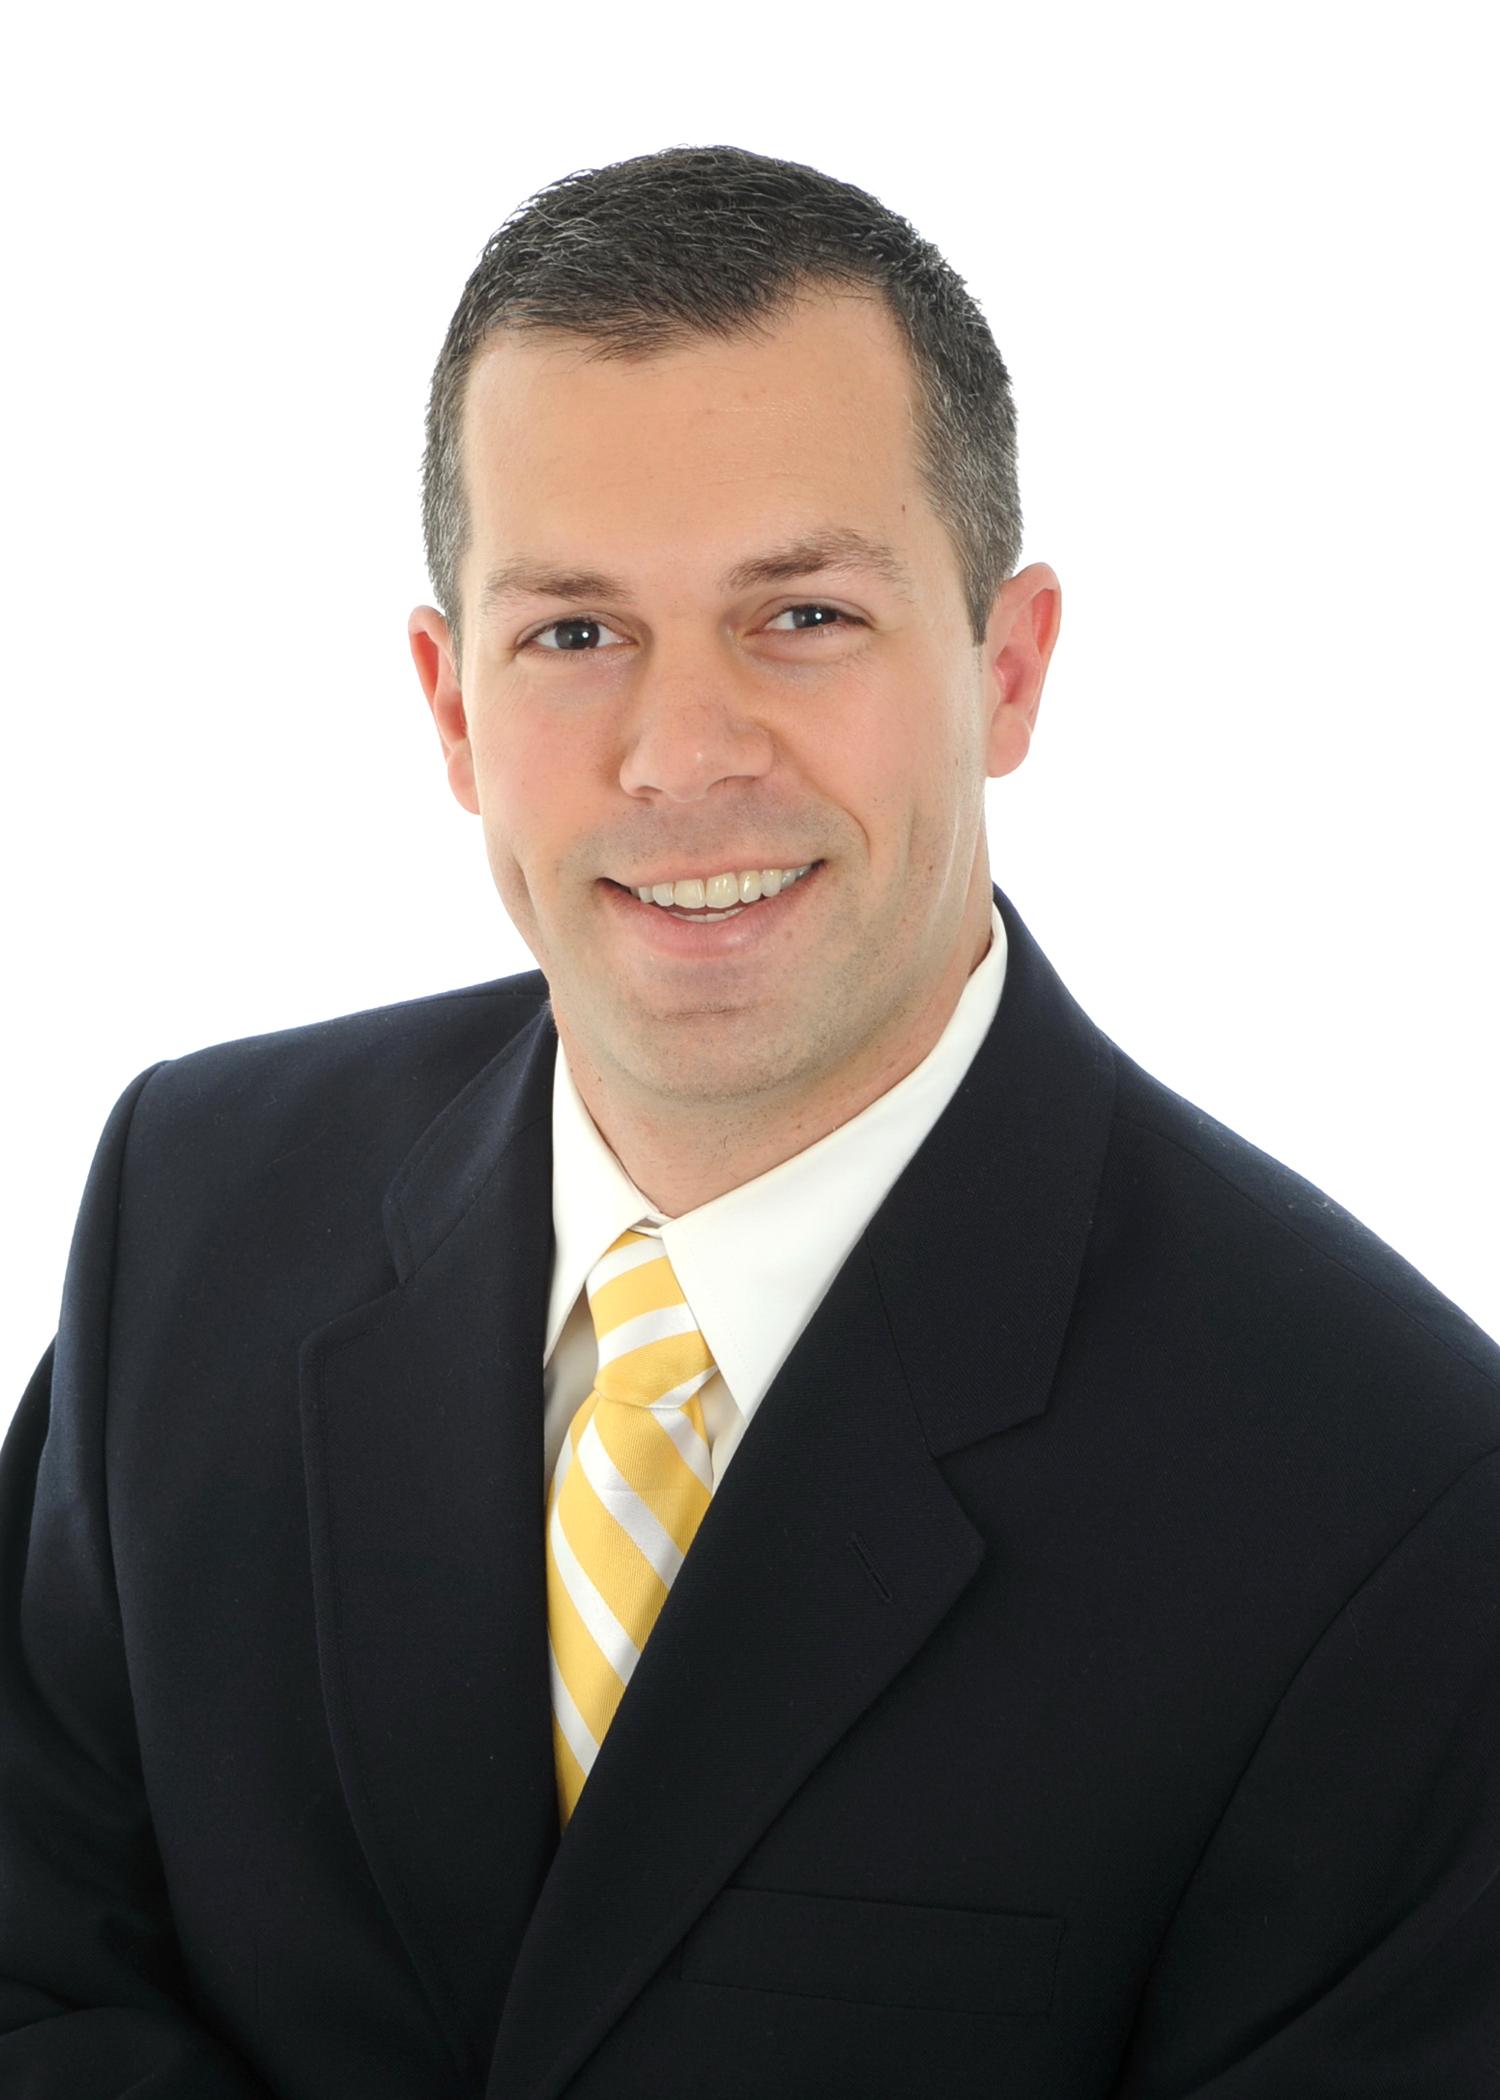 Aaron Pokorny, DDS, MD